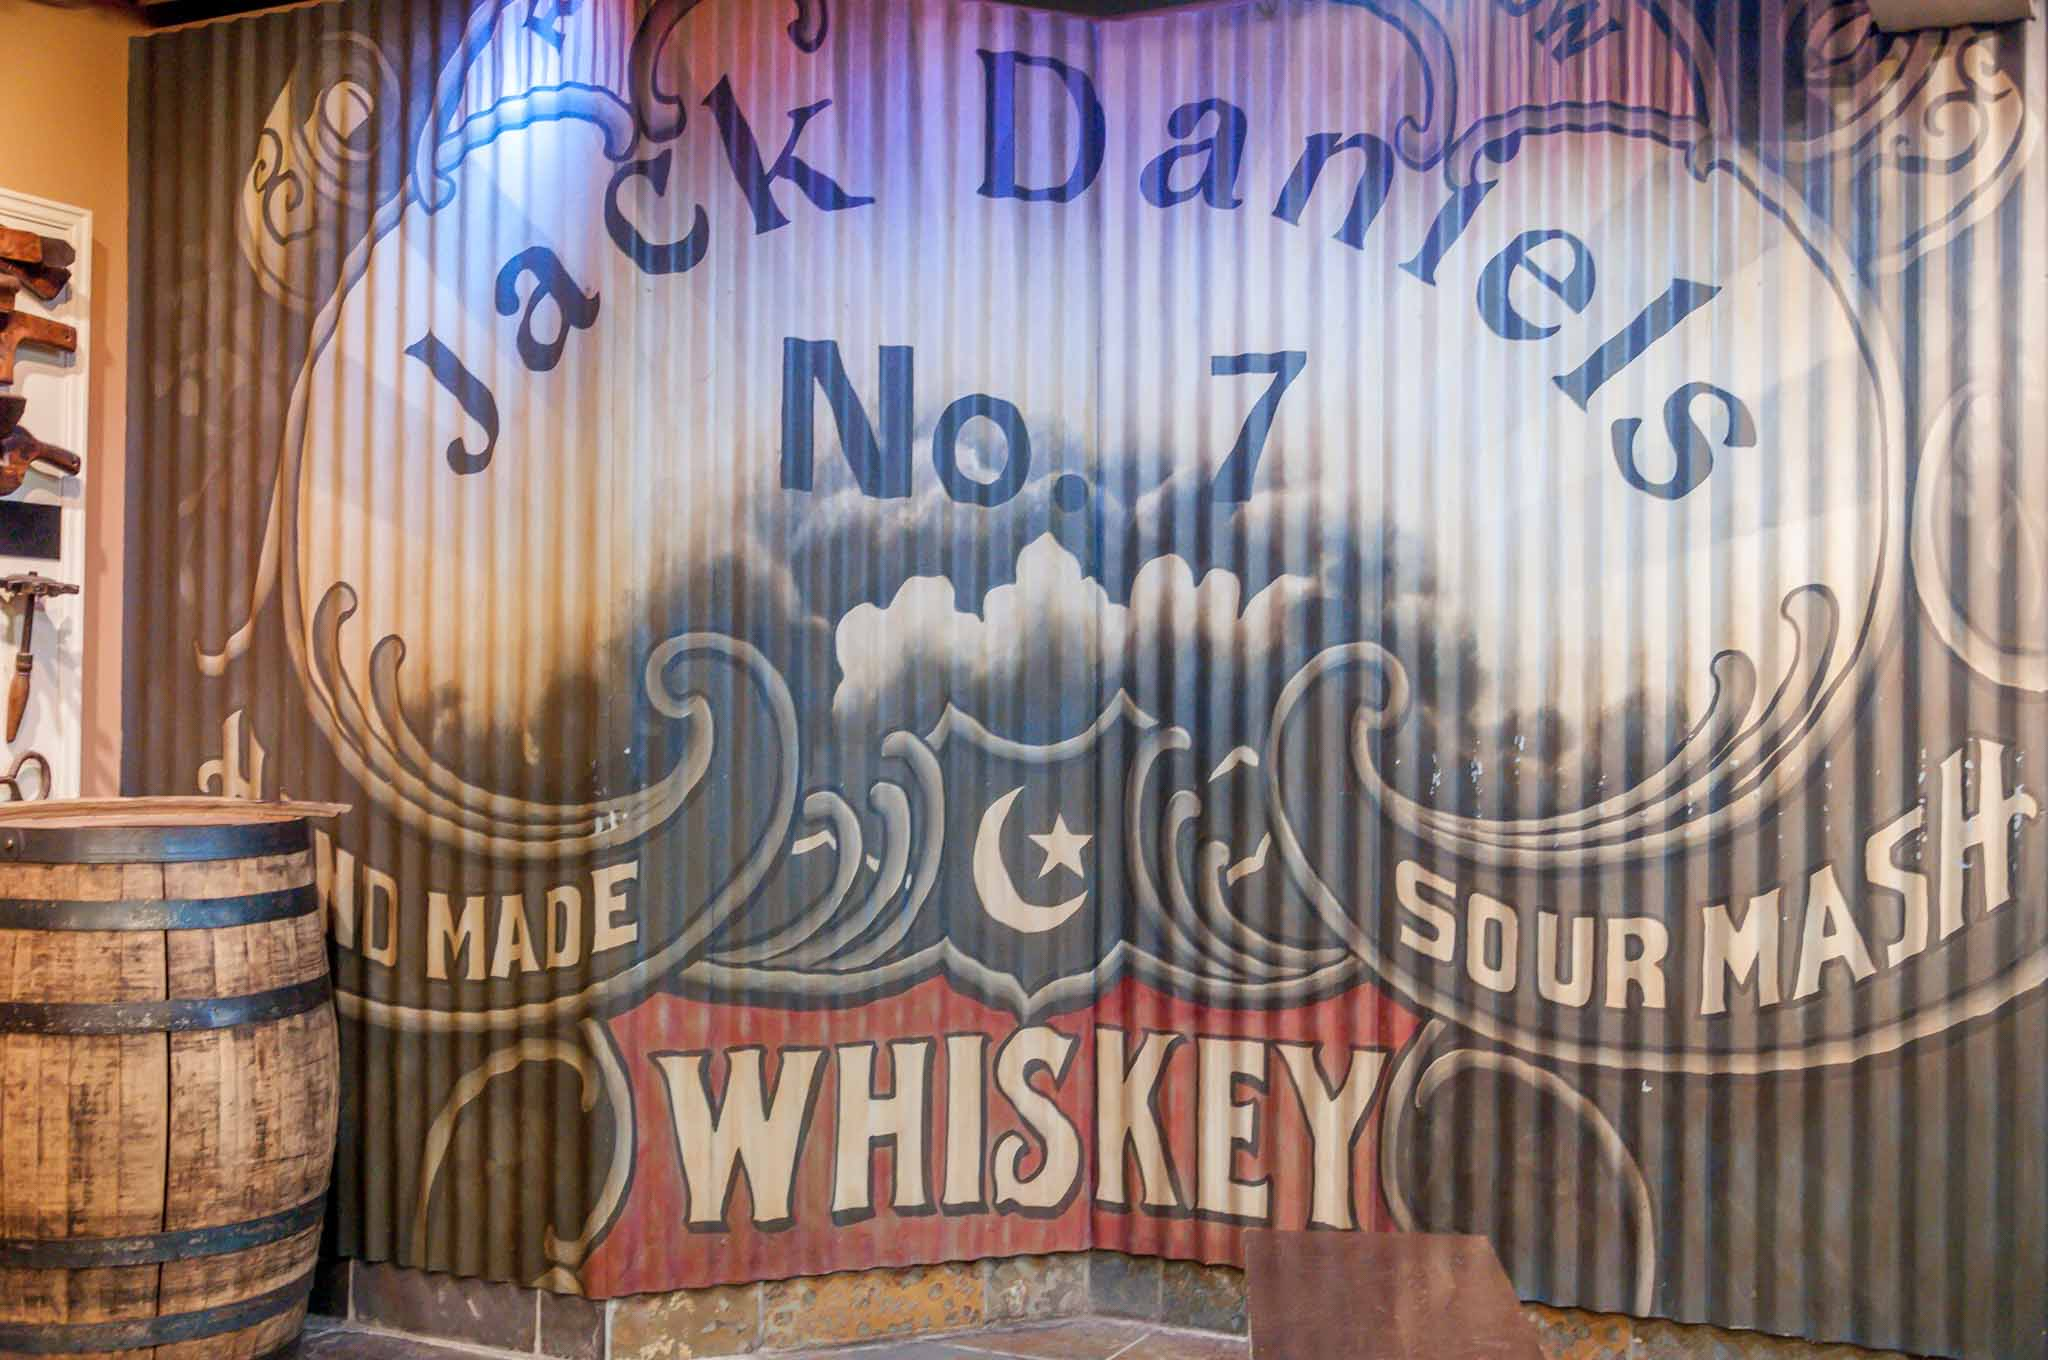 Jack Daniel's No. 7 Whiskey sign at the Jack Daniel's distillery